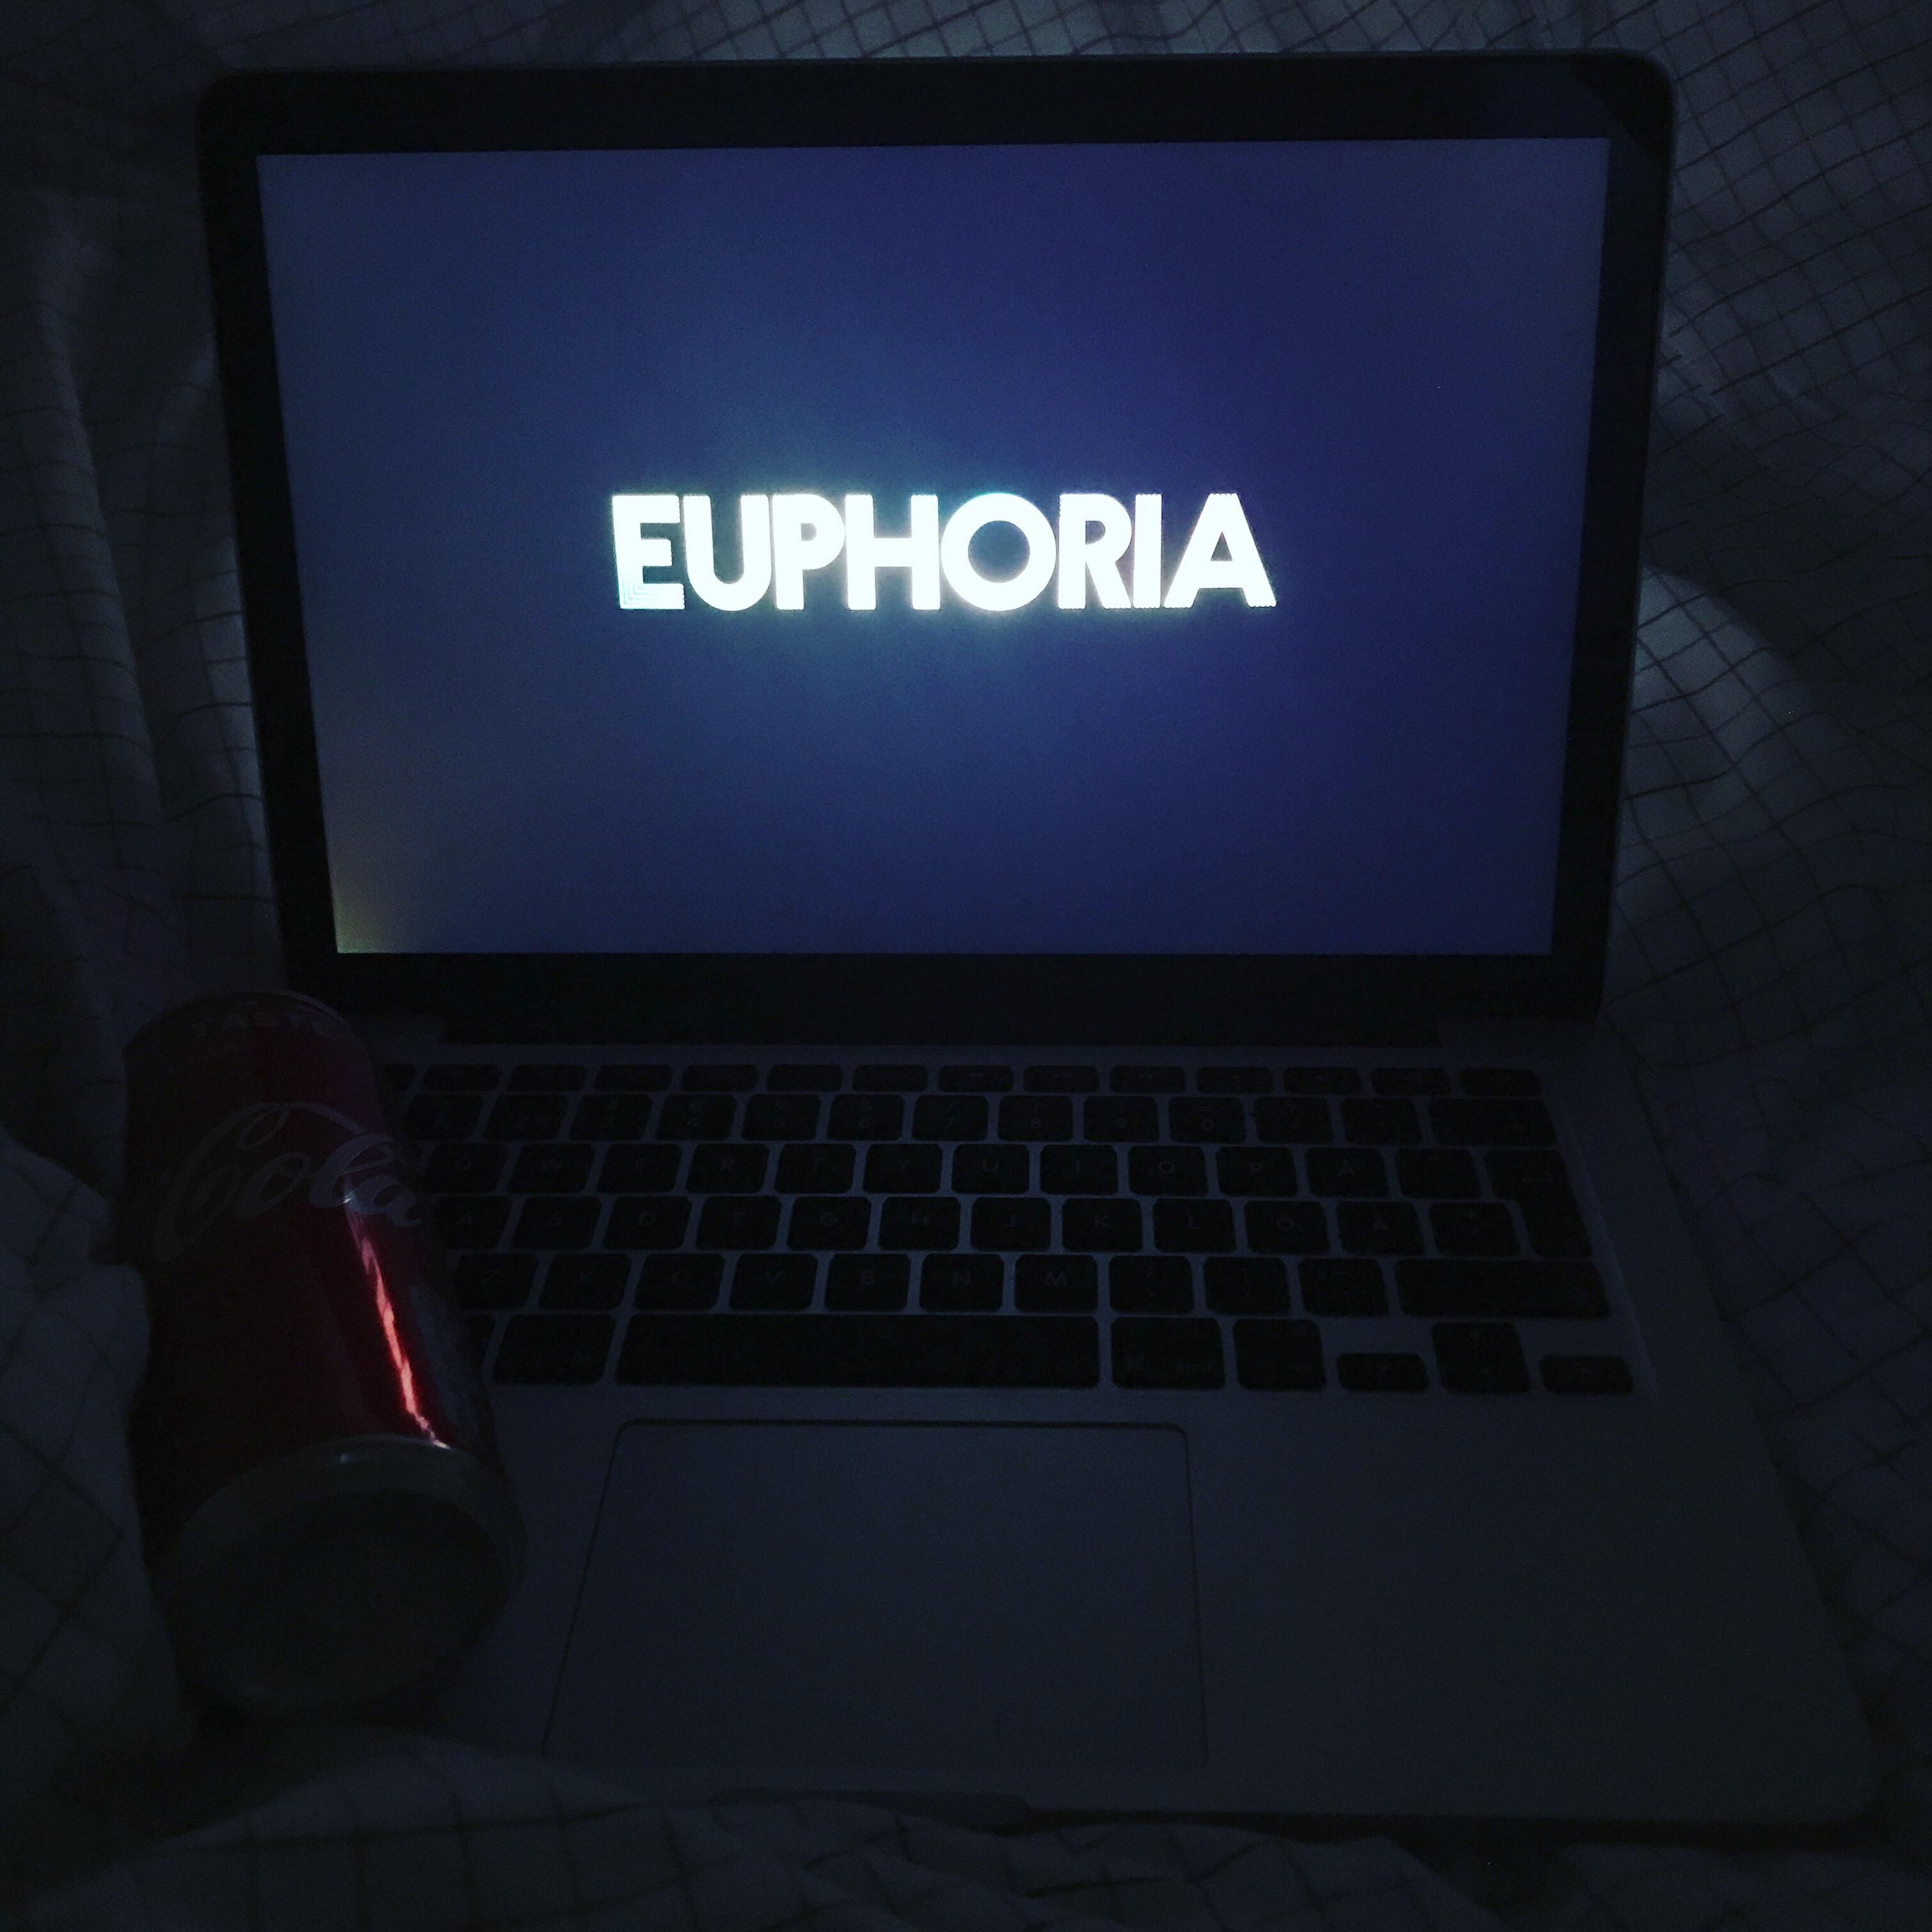 Euphoria Hbo Wallpapers Top Free Euphoria Hbo Backgrounds Wallpaperaccess